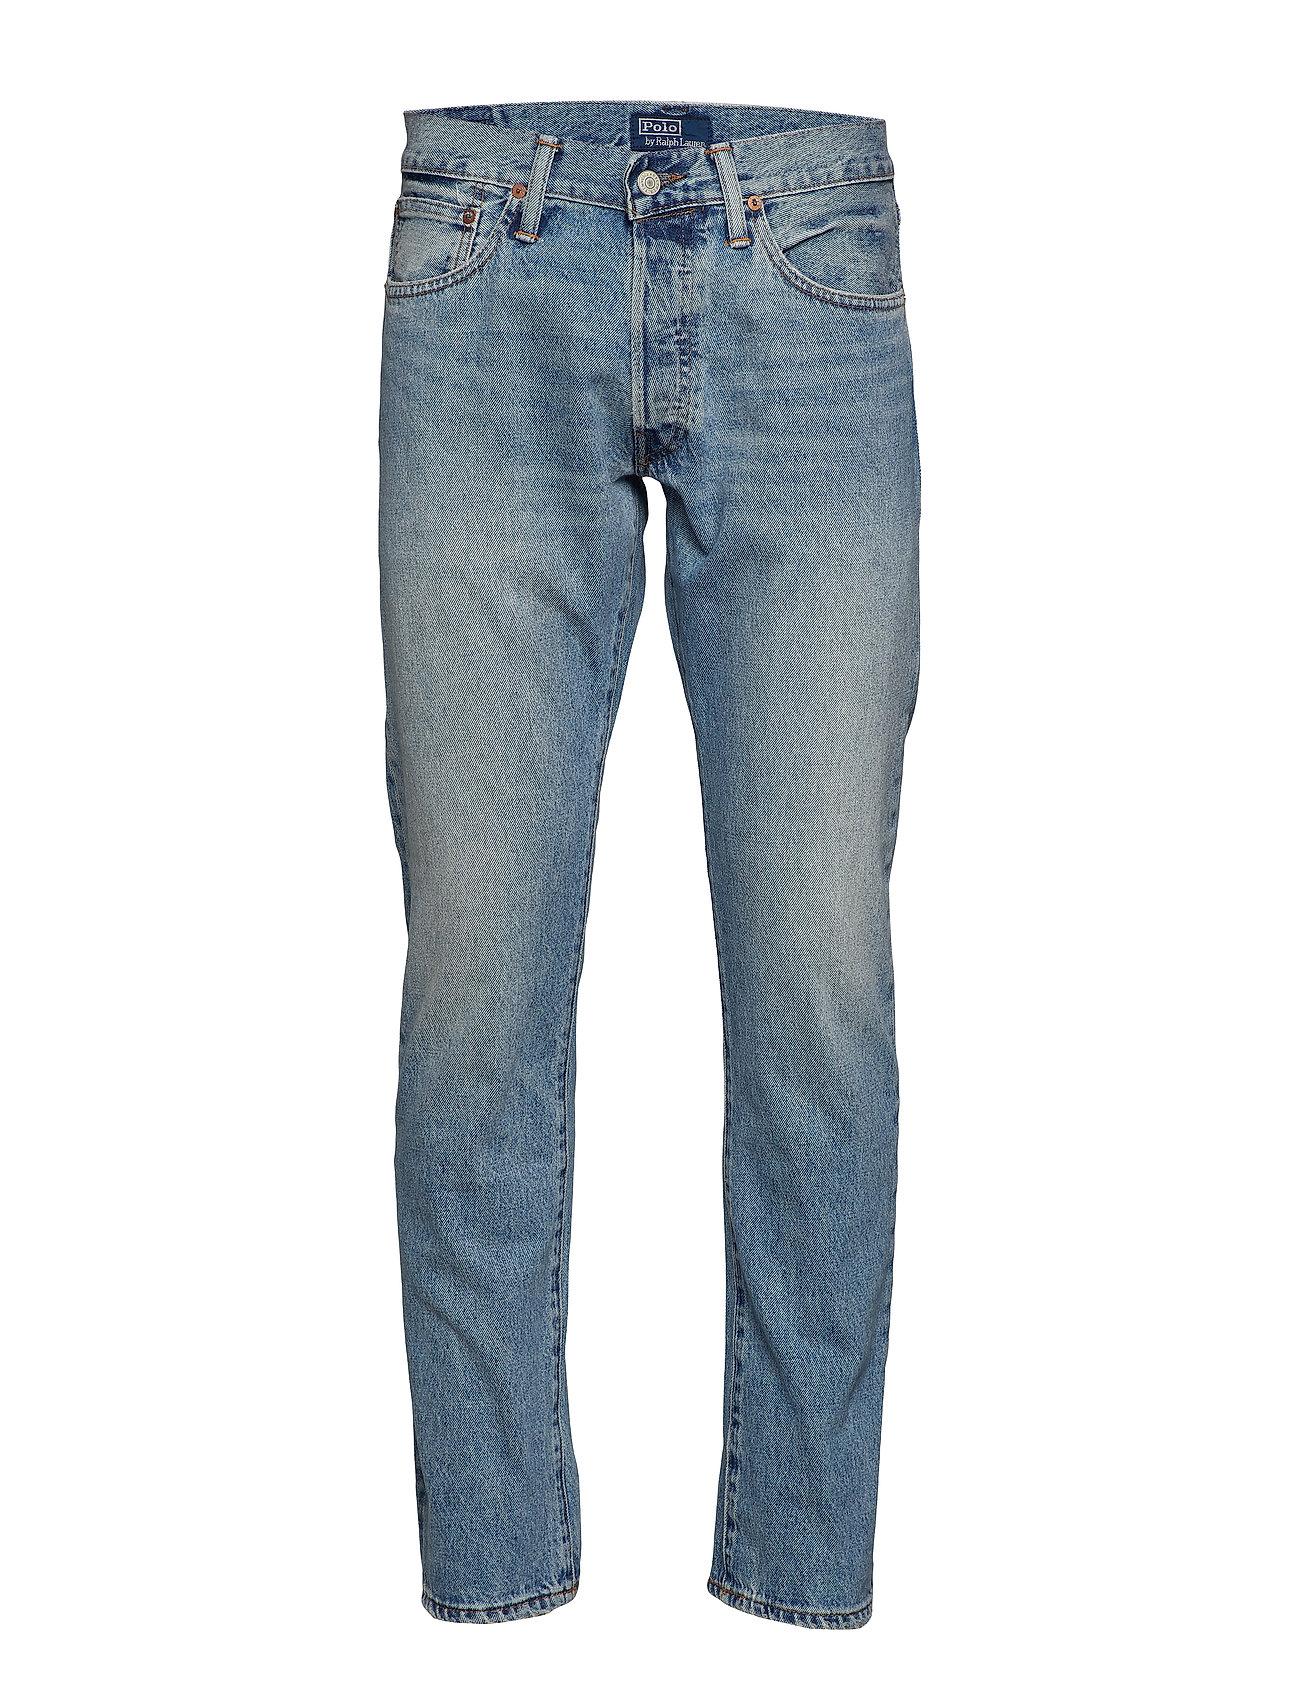 Polo Ralph Lauren Varick Slim Straight Jean Jeans